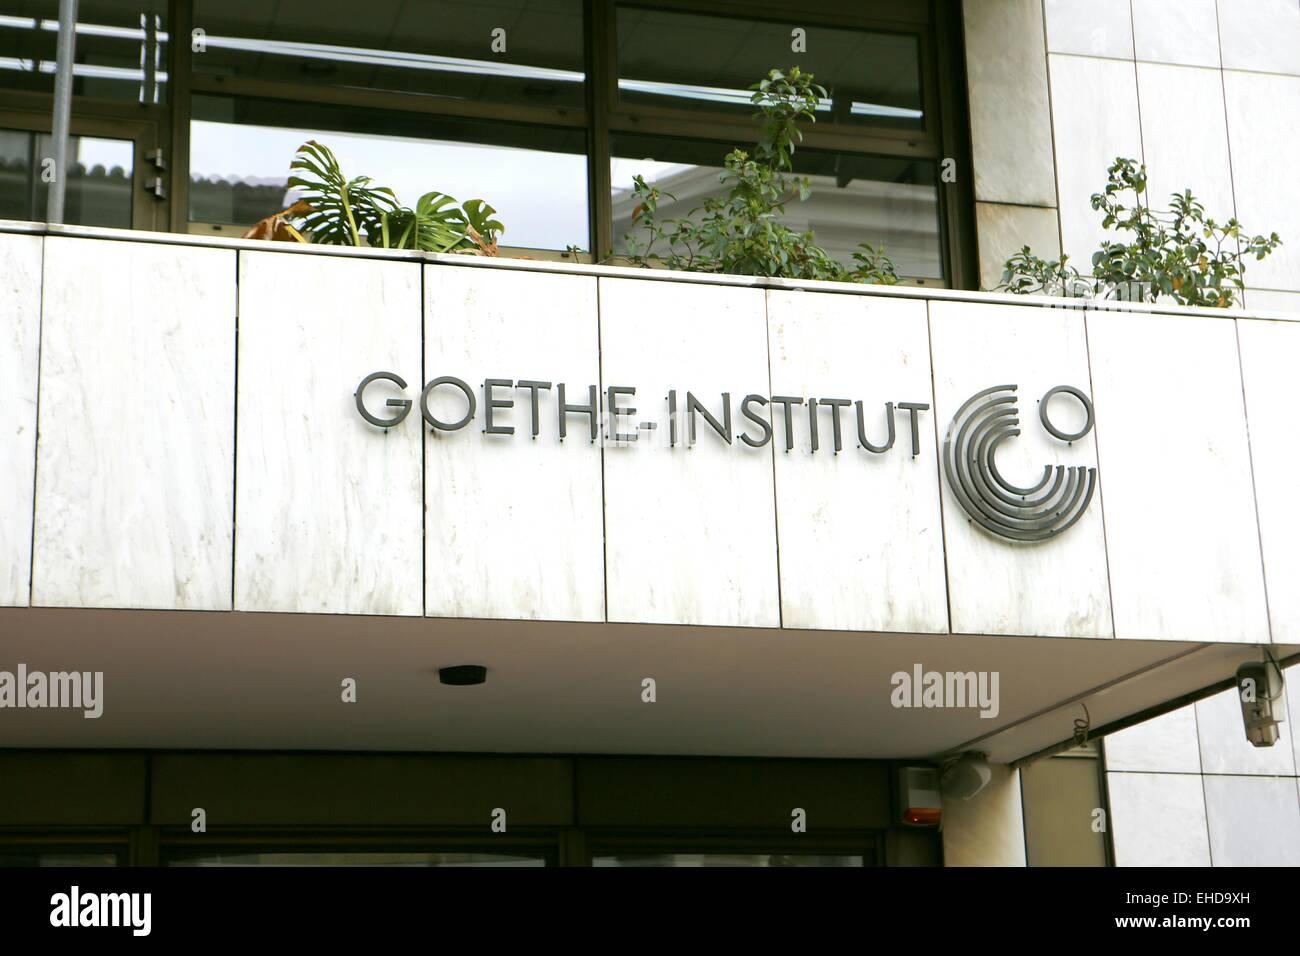 Goethe-Institut Athen - Home | Facebook